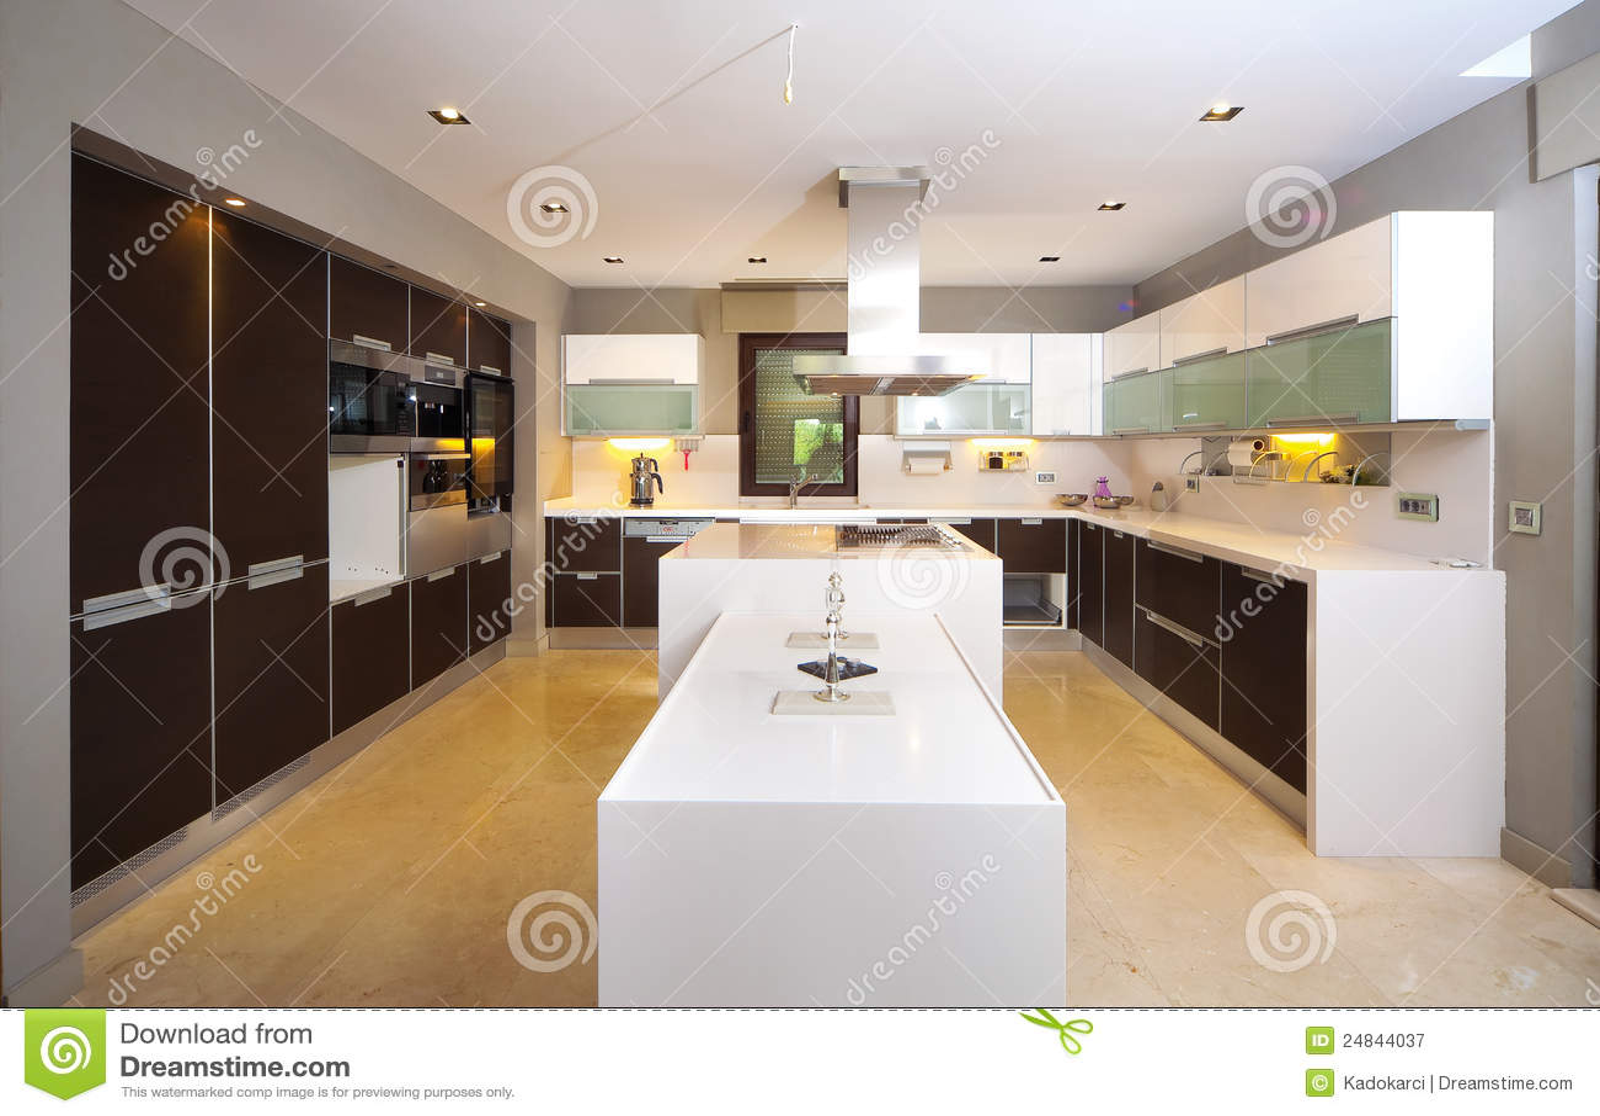 cuisine moderne image stock image du construit int rieur 24844037. Black Bedroom Furniture Sets. Home Design Ideas